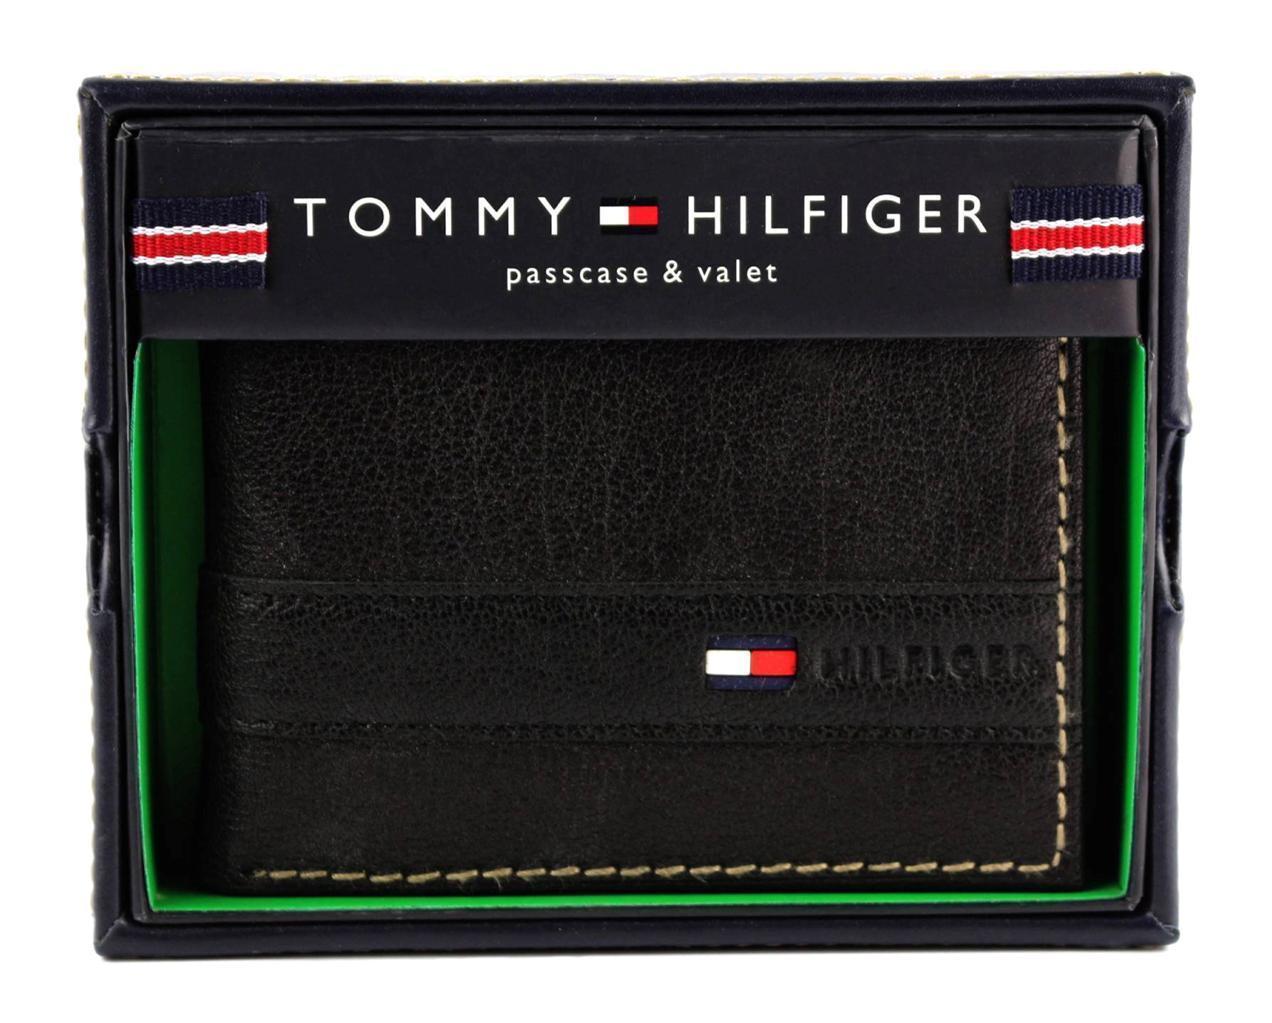 NEW TOMMY HILFIGER MEN'S LEATHER CREDIT CARD ID WALLET BILLFOLD BLACK 4384/01